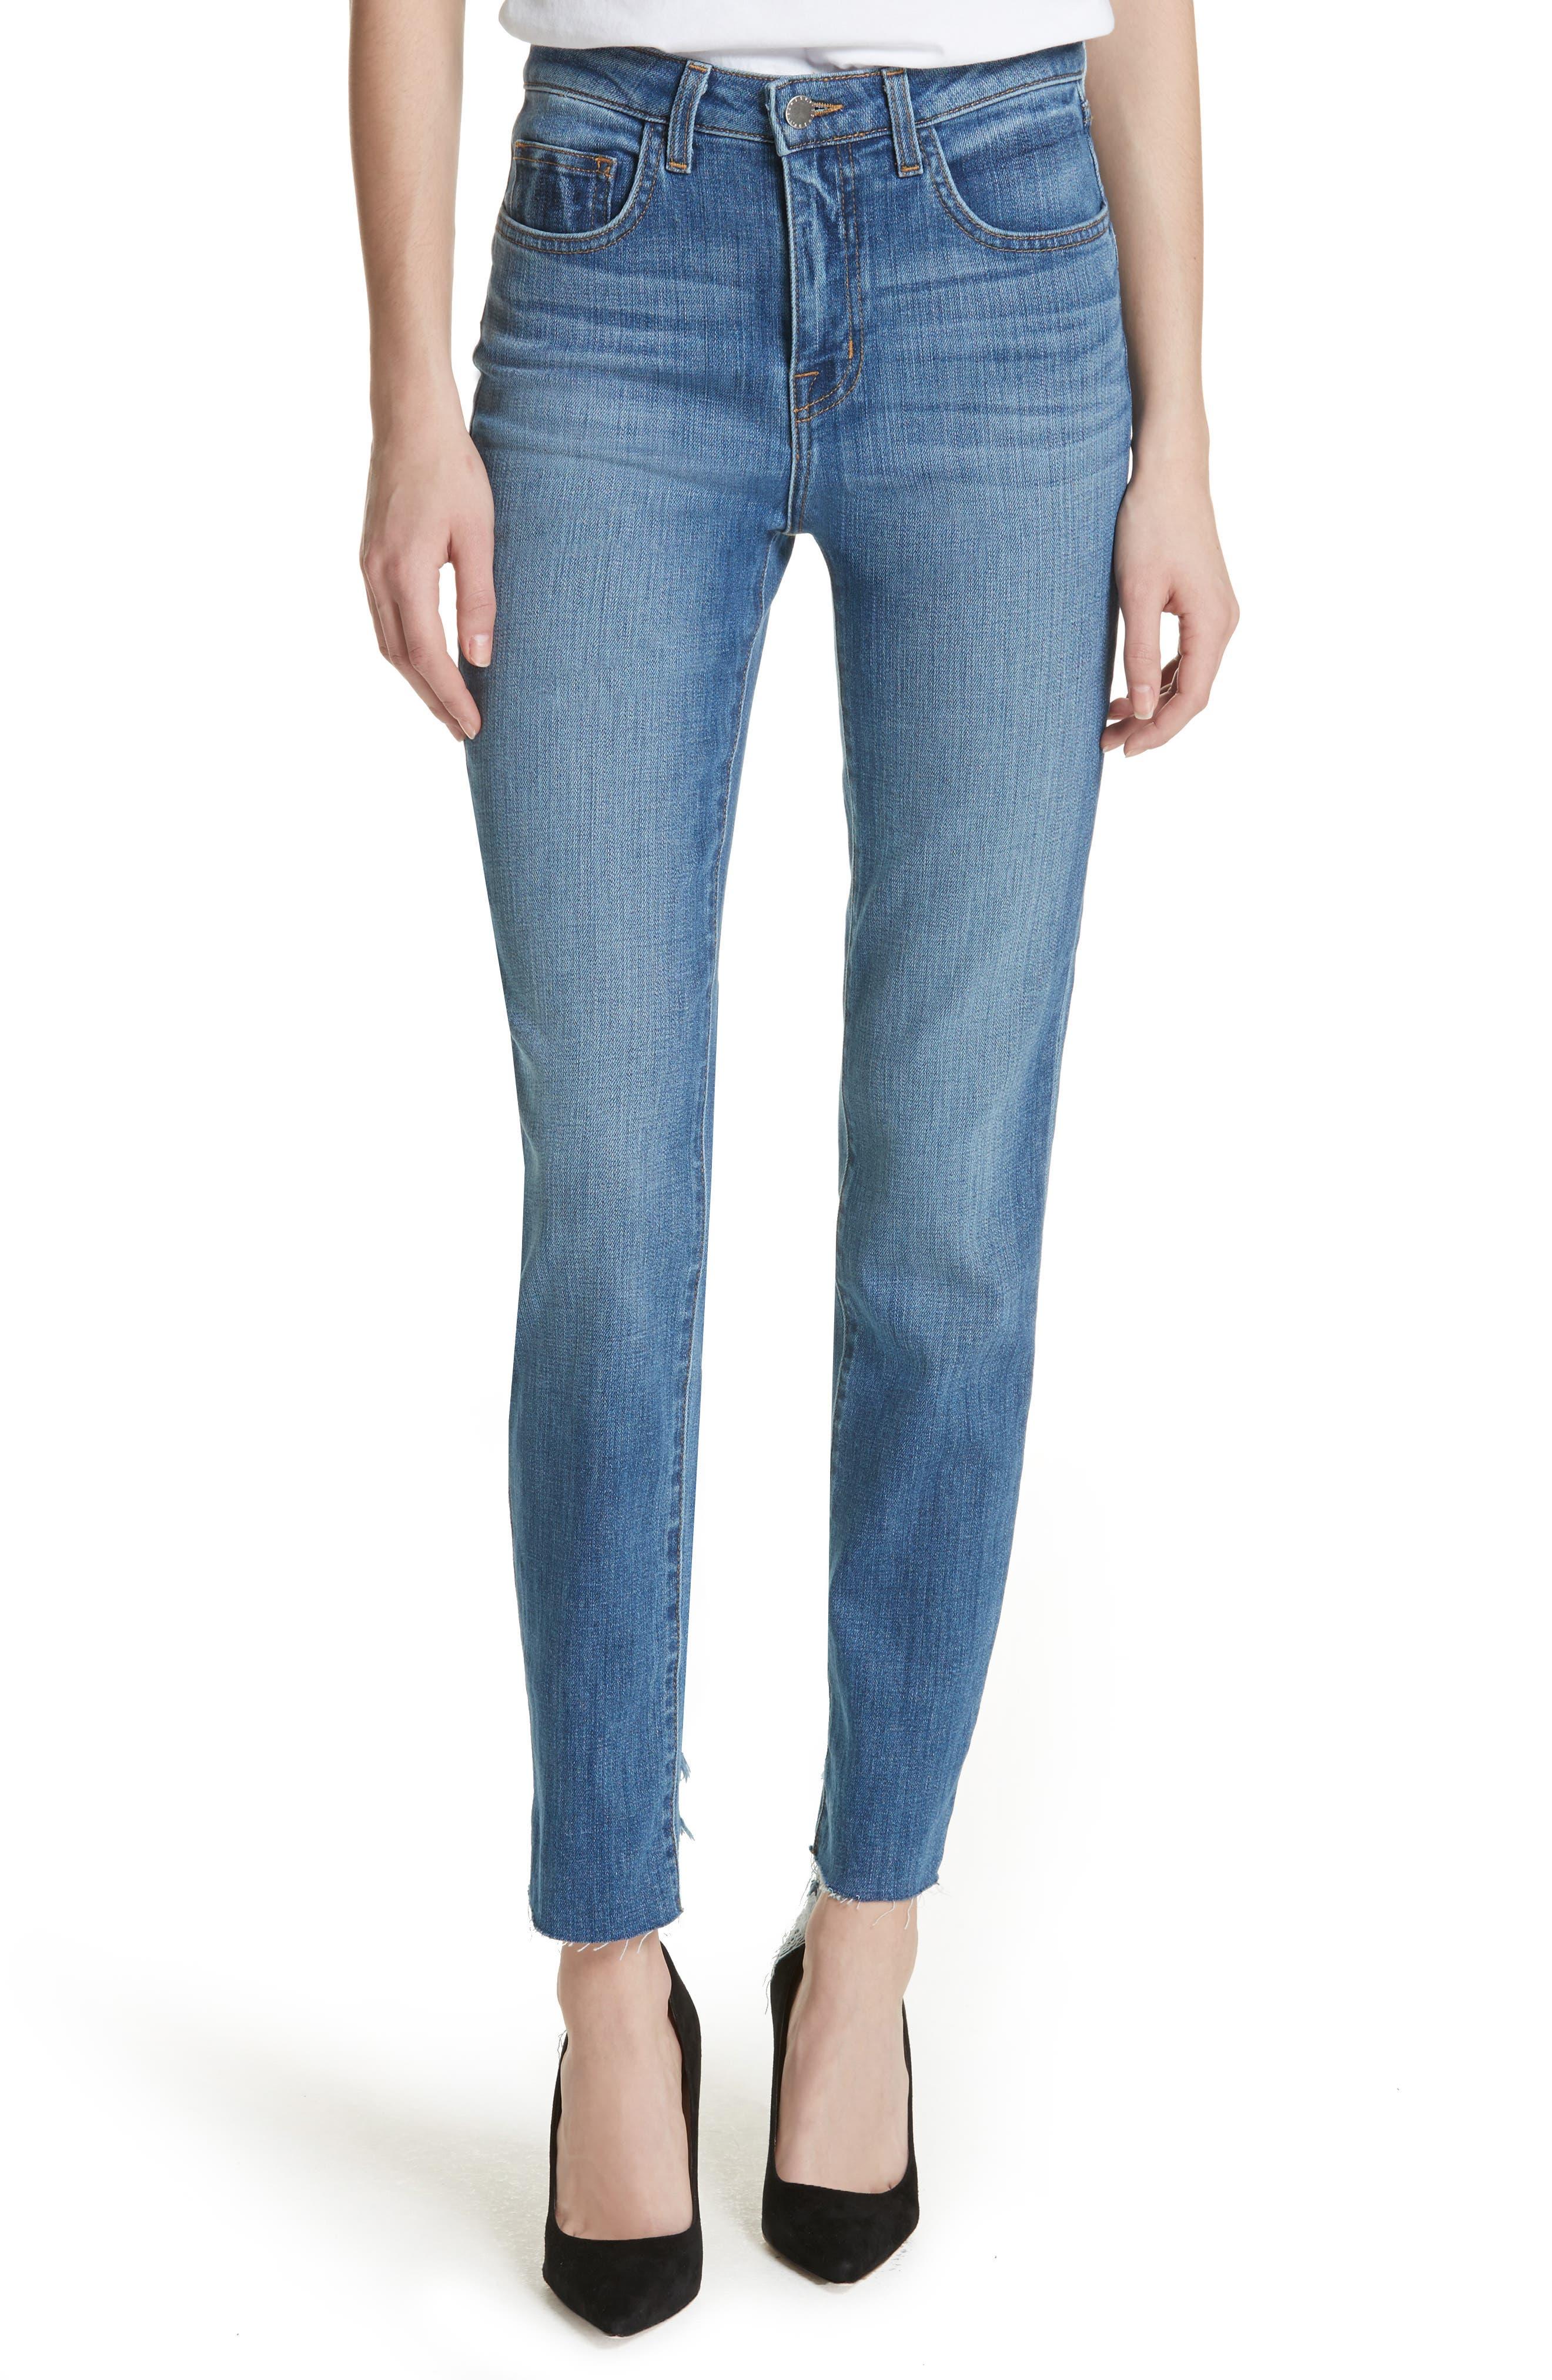 Lorelei High Waist Slim Straight Jeans,                             Main thumbnail 1, color,                             450